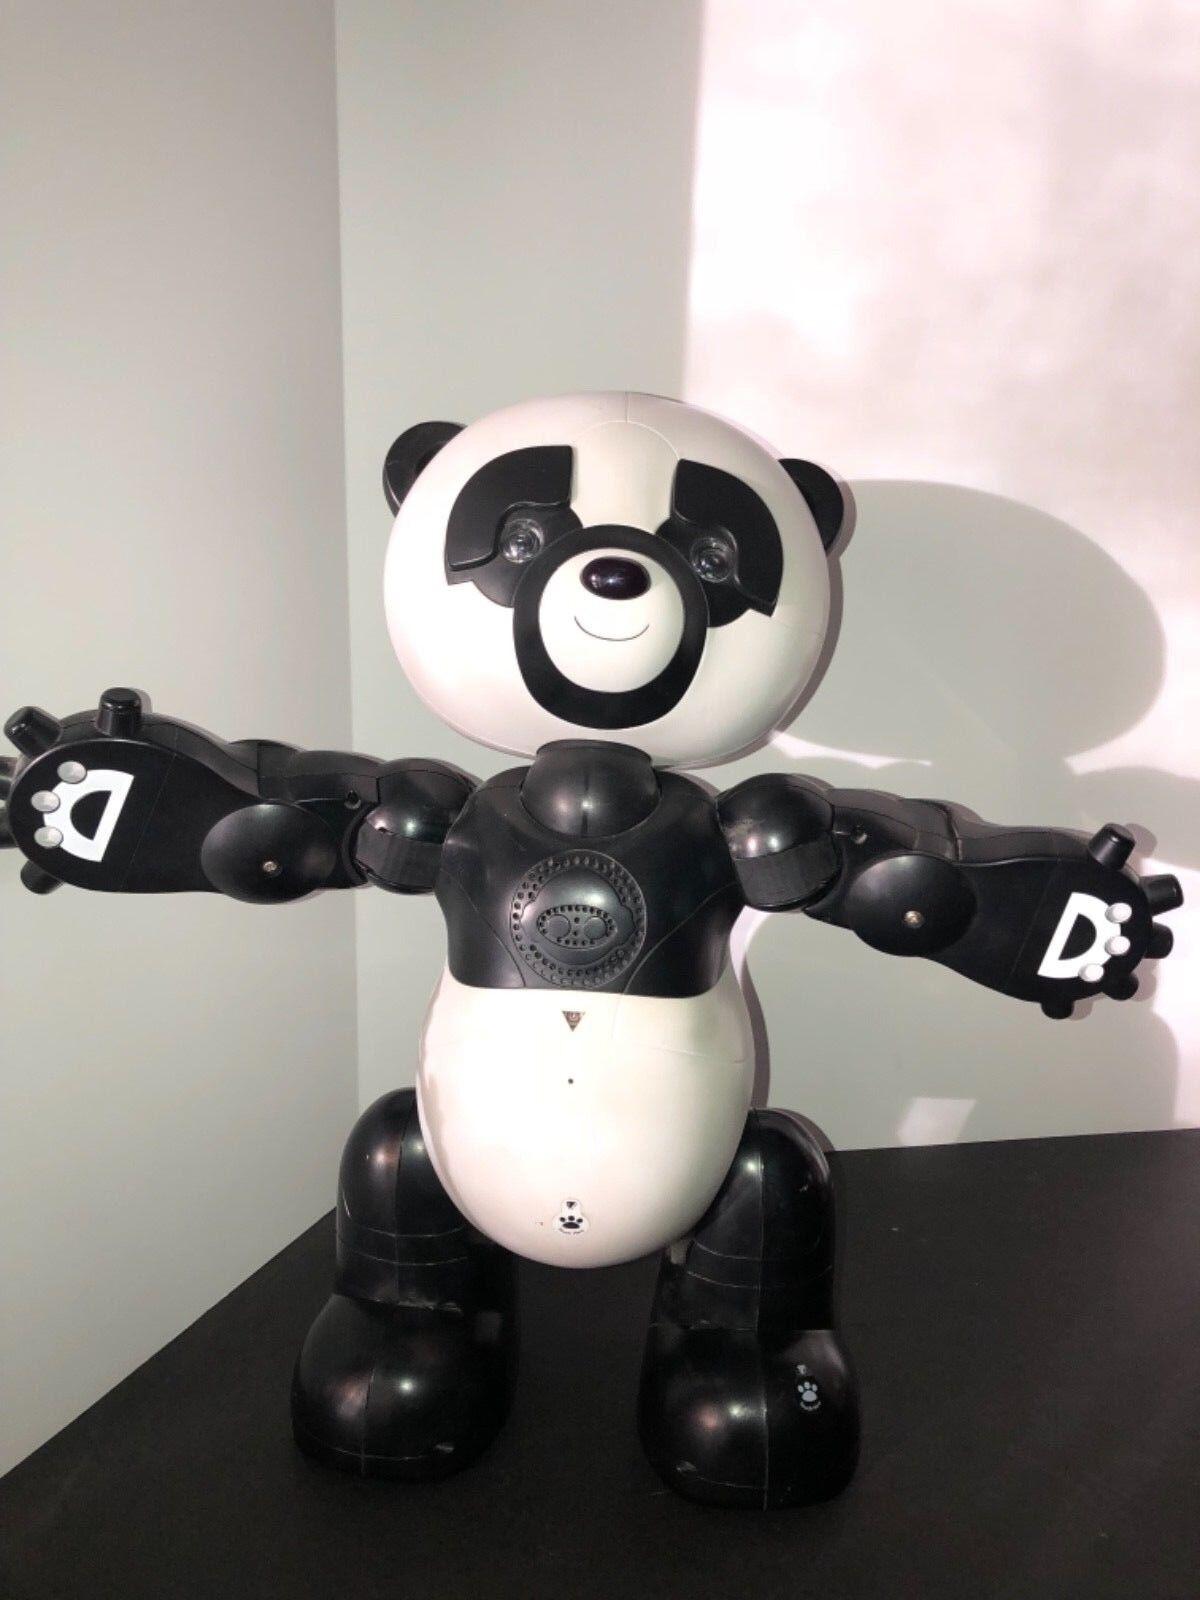 19  ROBO PeA BATTERY-OPERATED TALre INTERACTIVE  giocattolo BY WOW WEE 2007  marchio in liquidazione